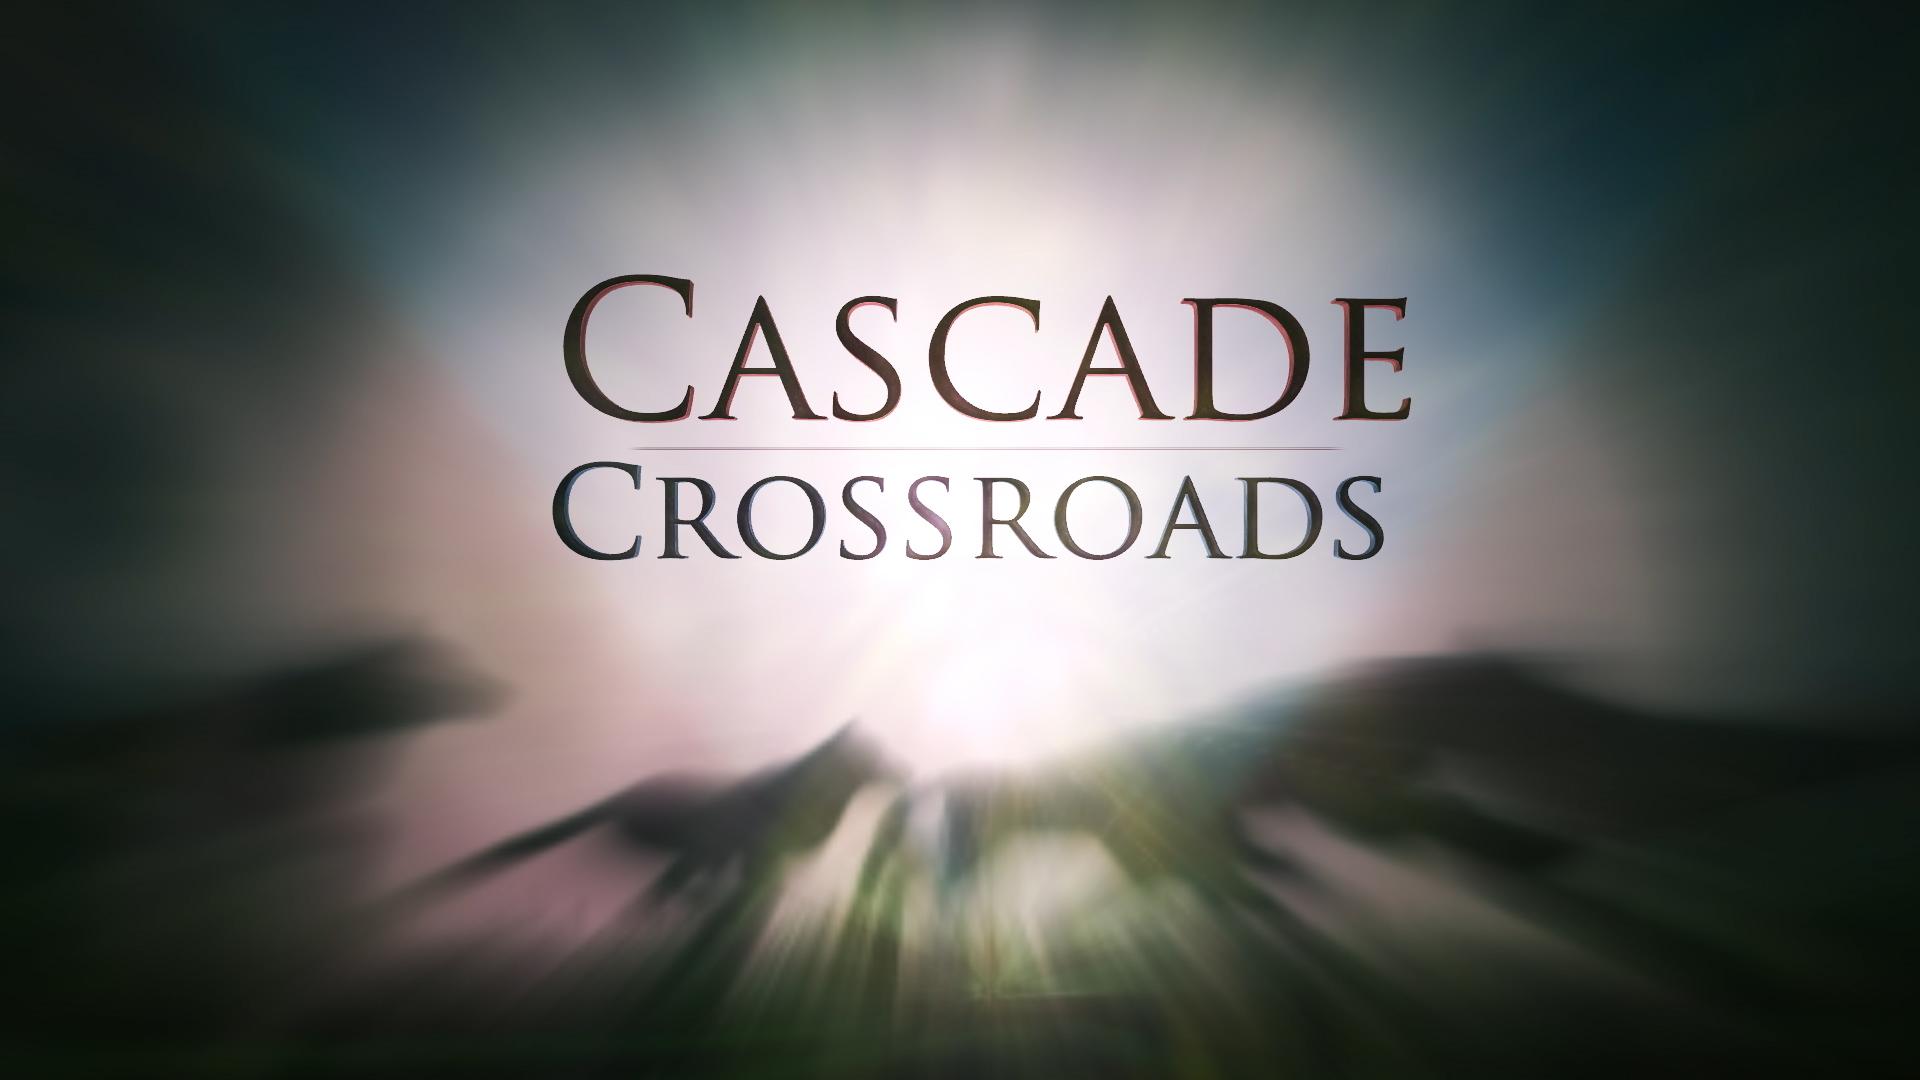 Cascade Crossroads promo still 9.jpg